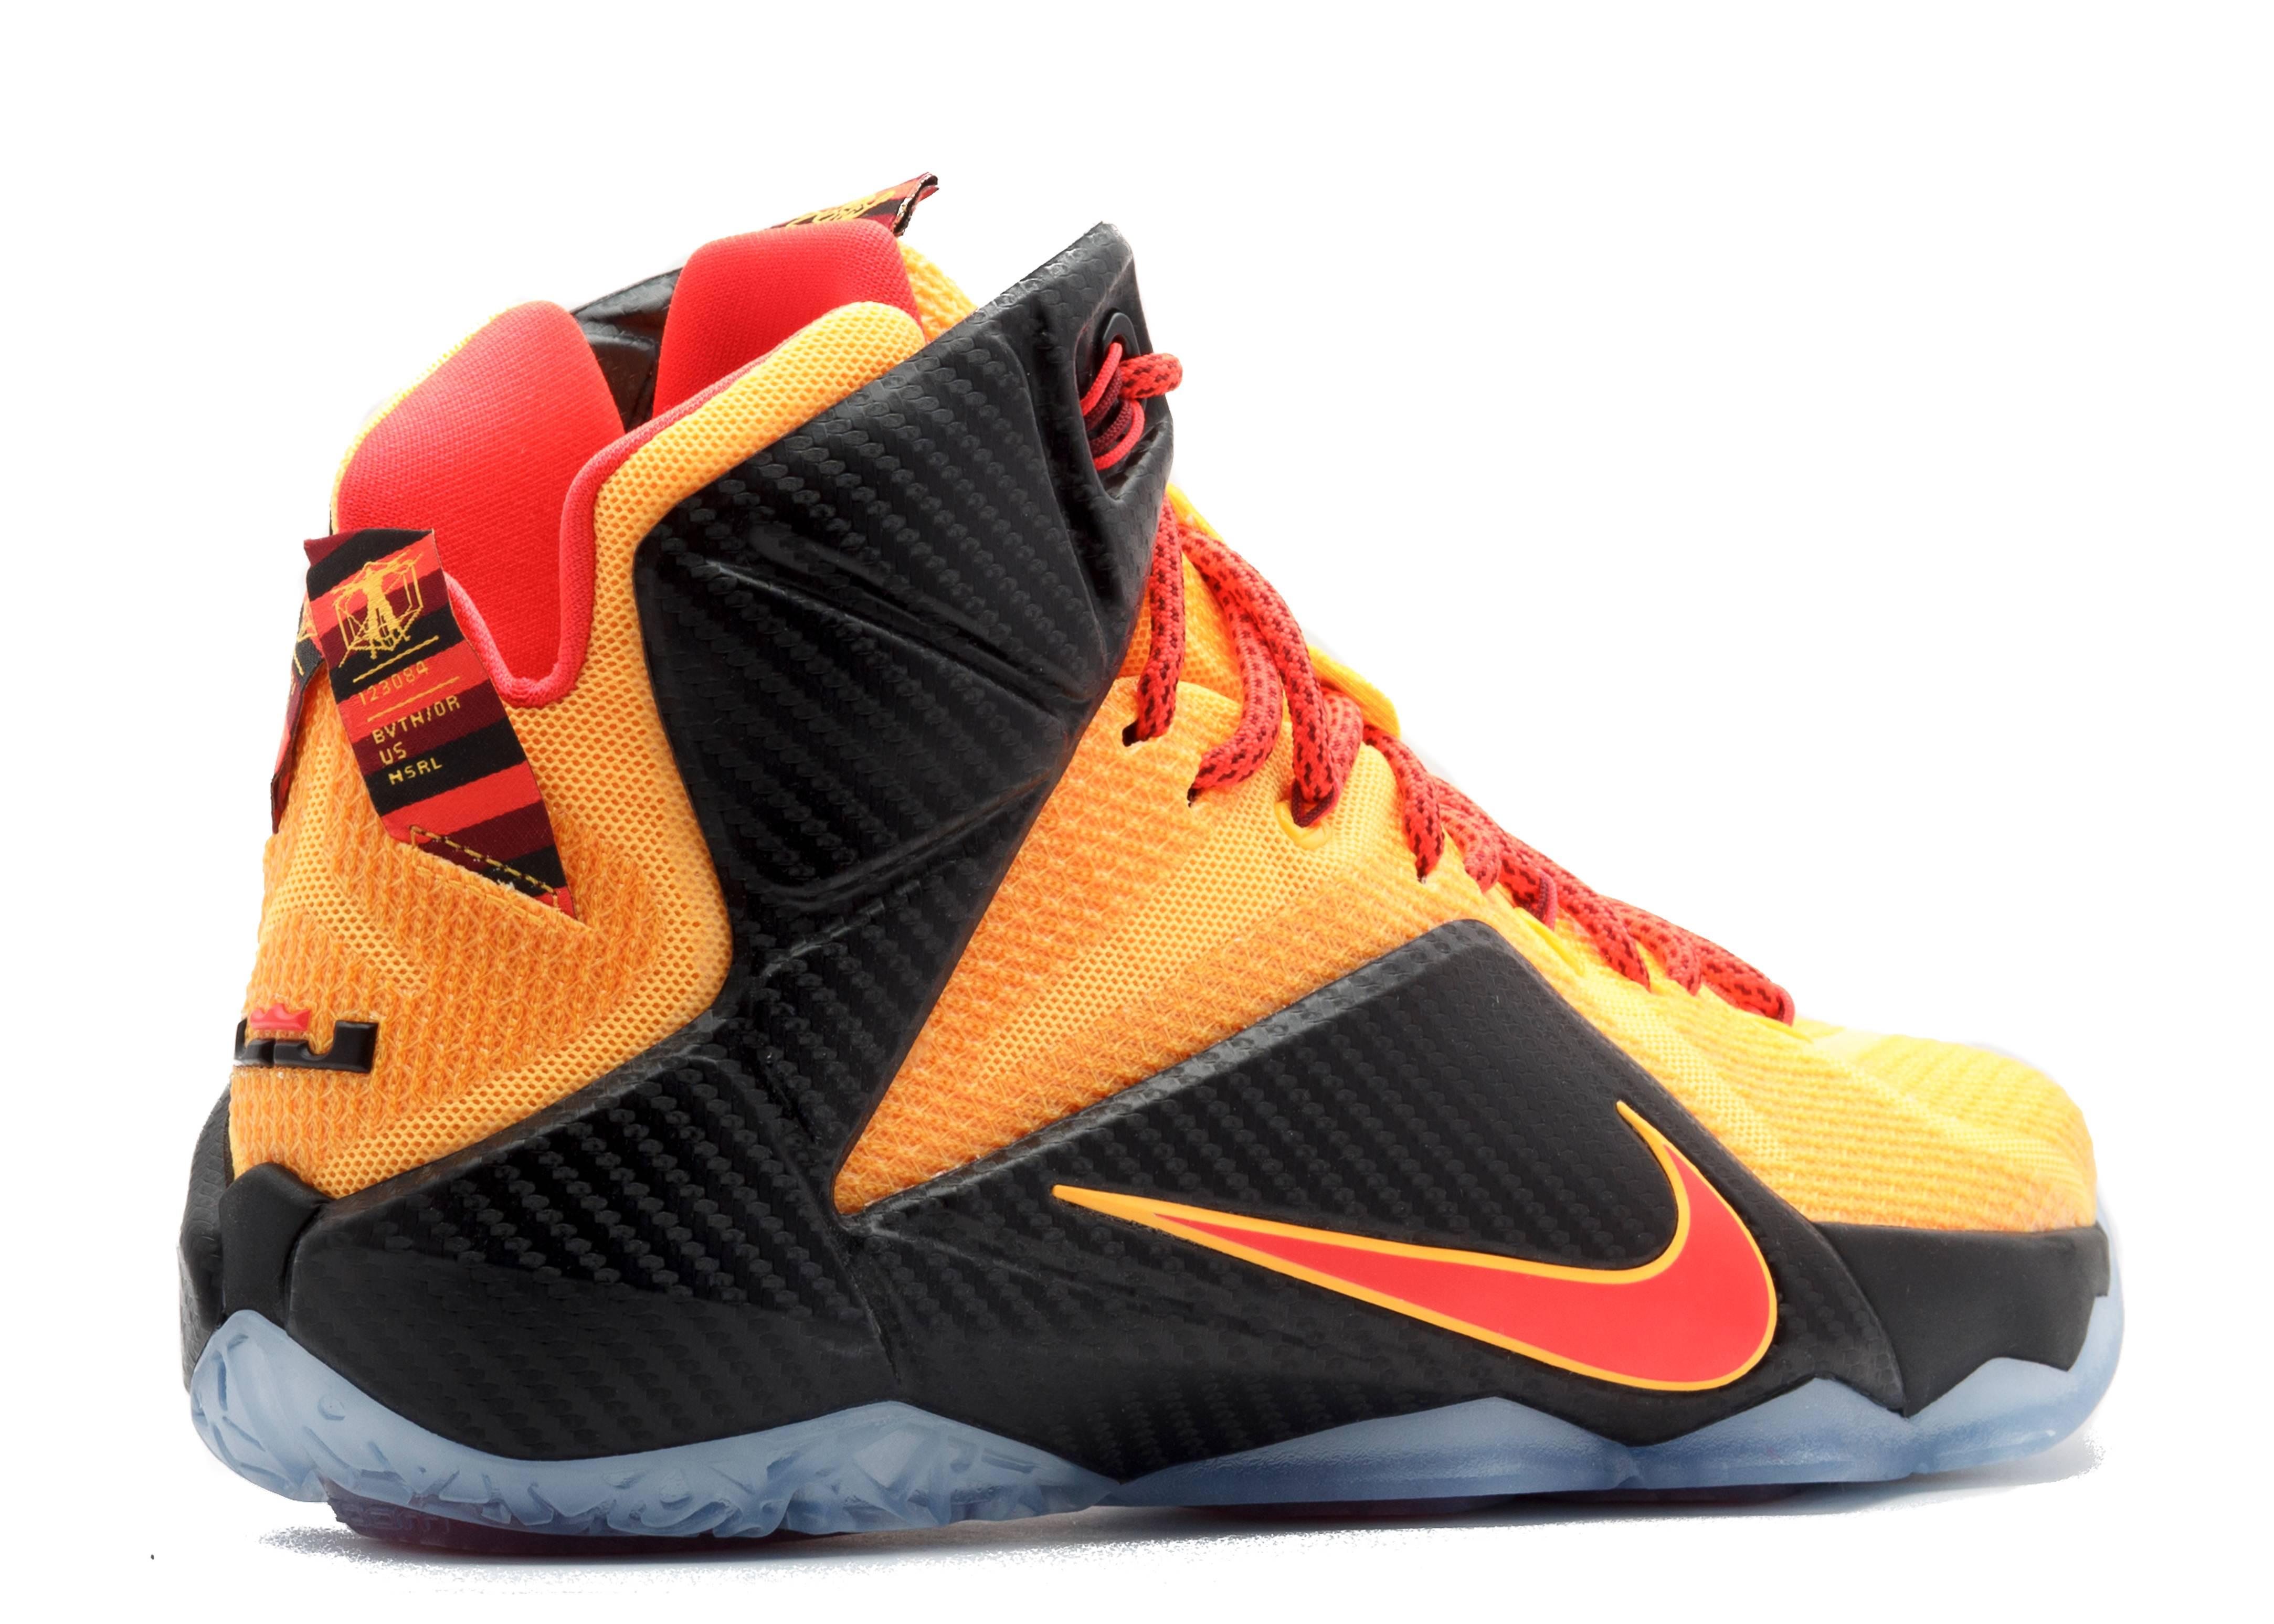 Lebron 12 - Nike - 684593 830 - laser orange/bright ...